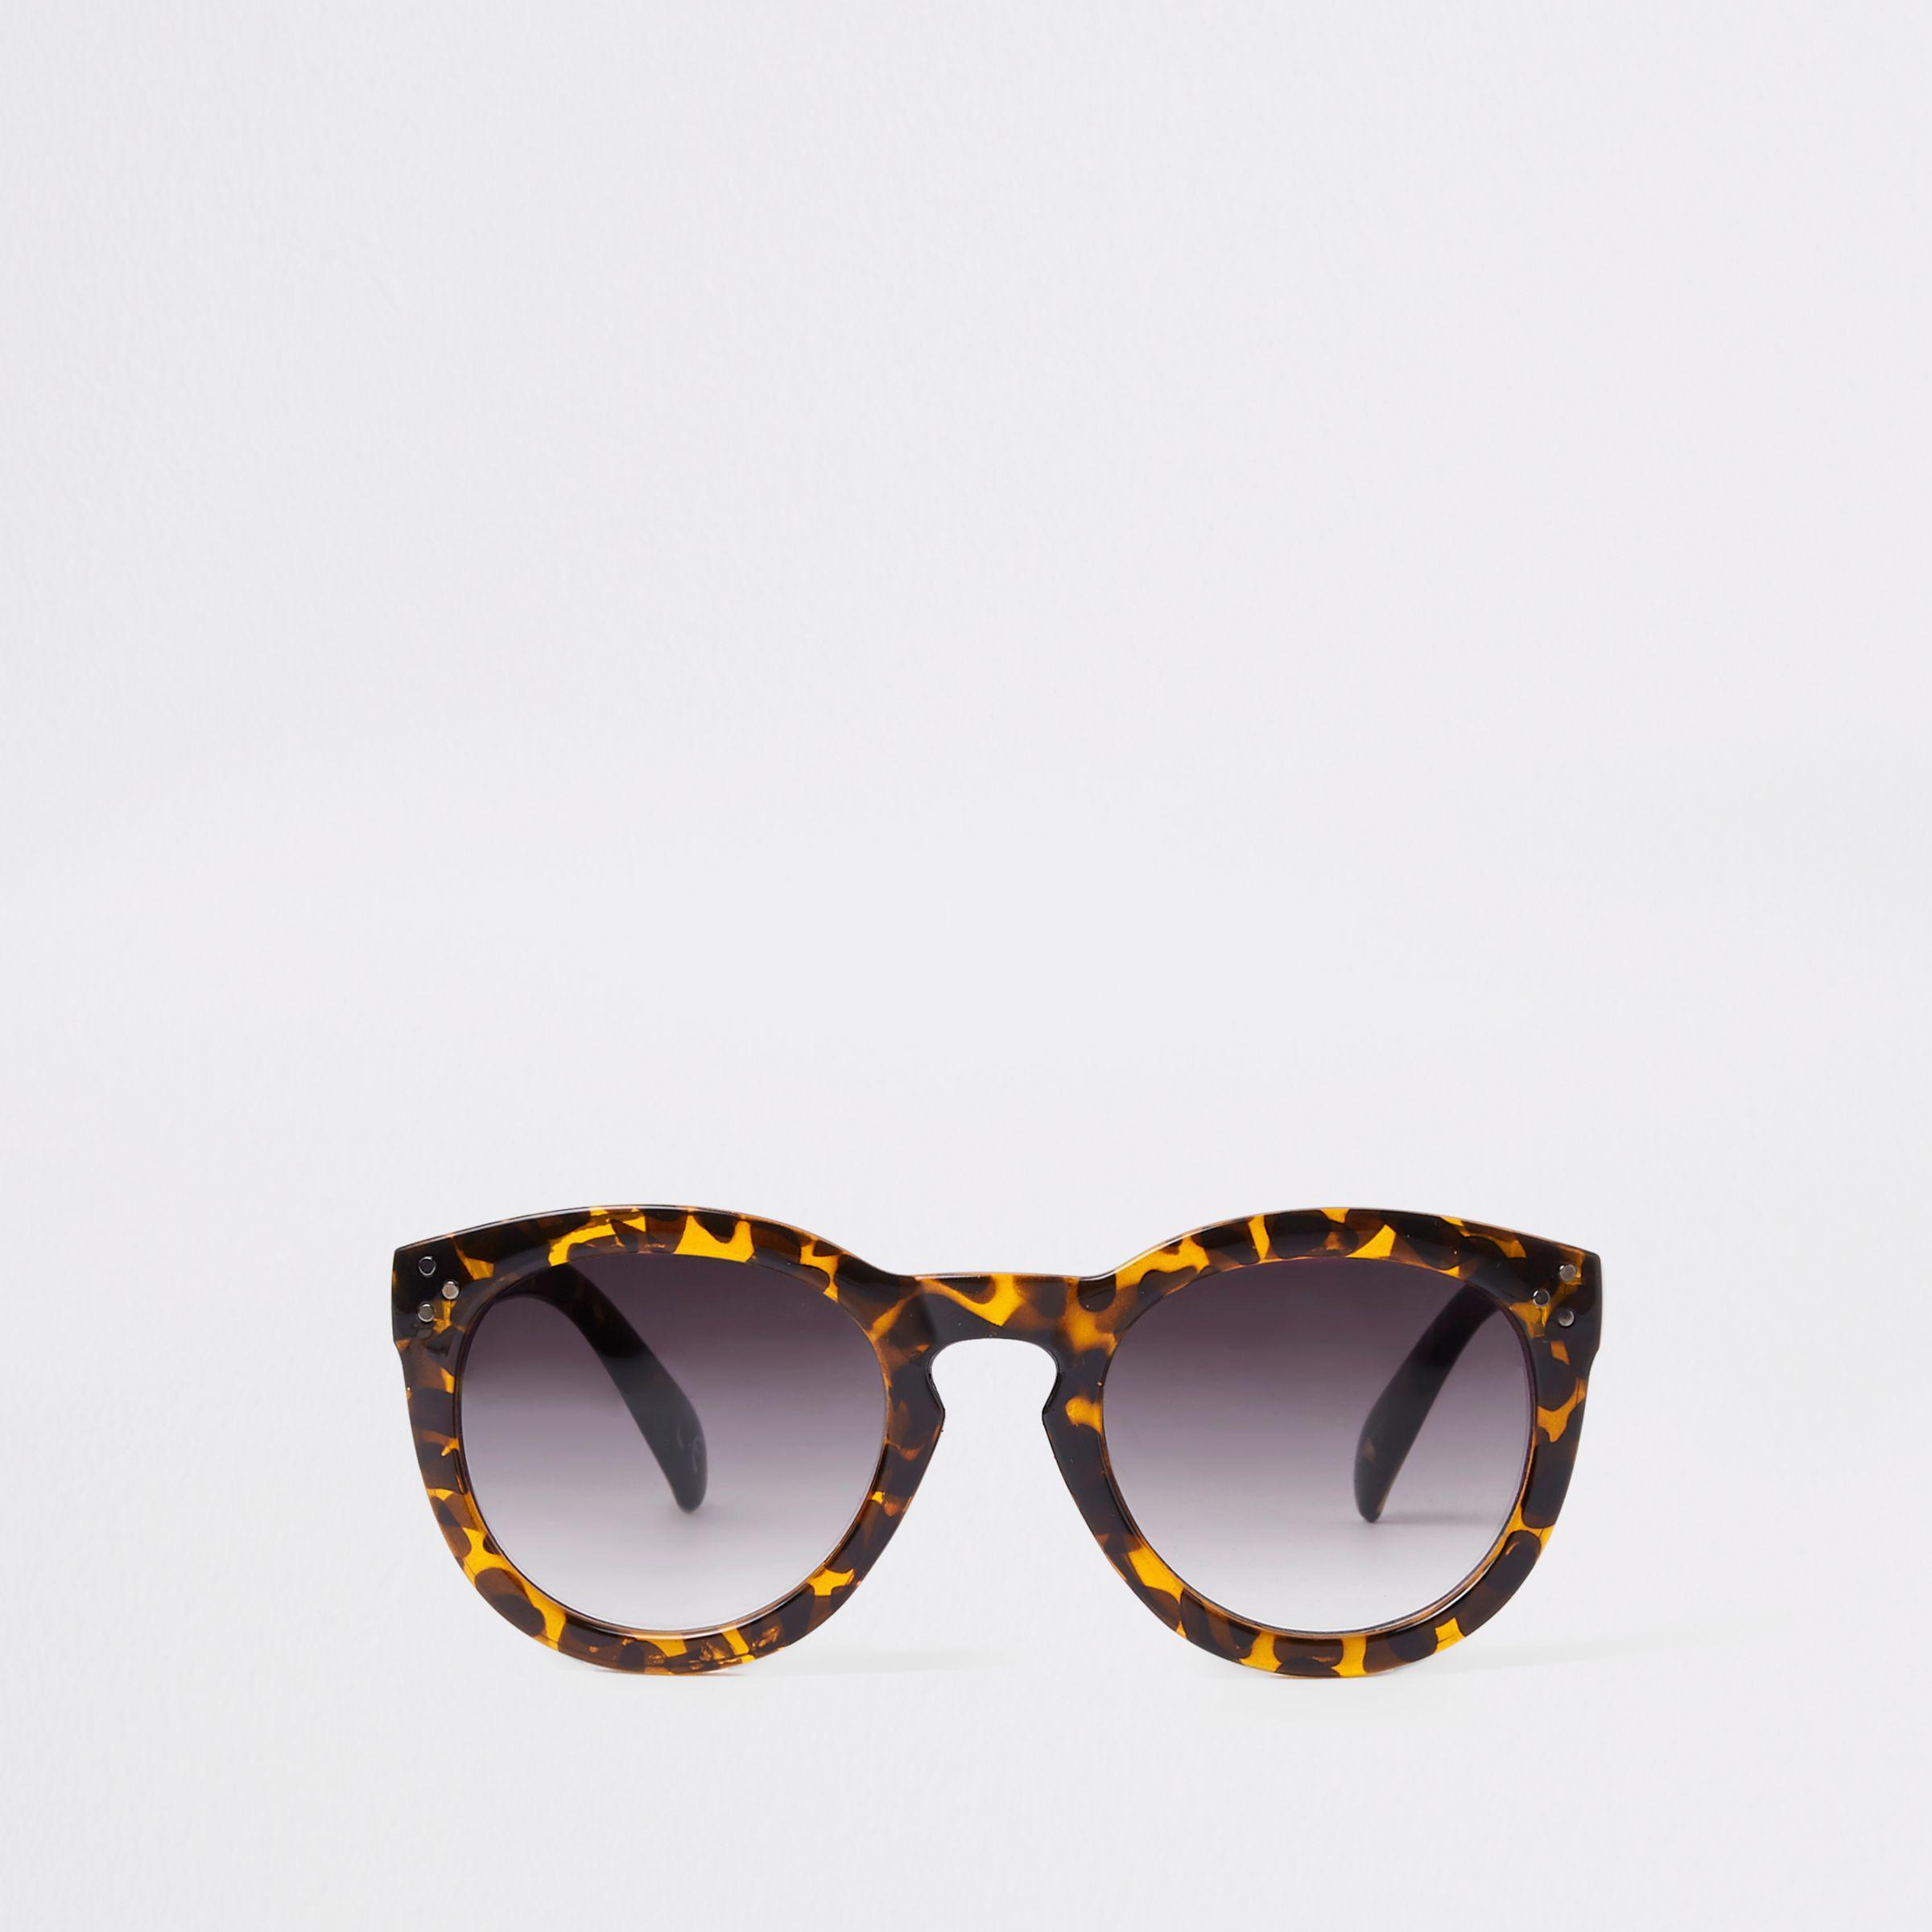 5fb5426b4c9 Lyst - River Island Brown Leopard Print Smoke Lens Sunglasses in Brown